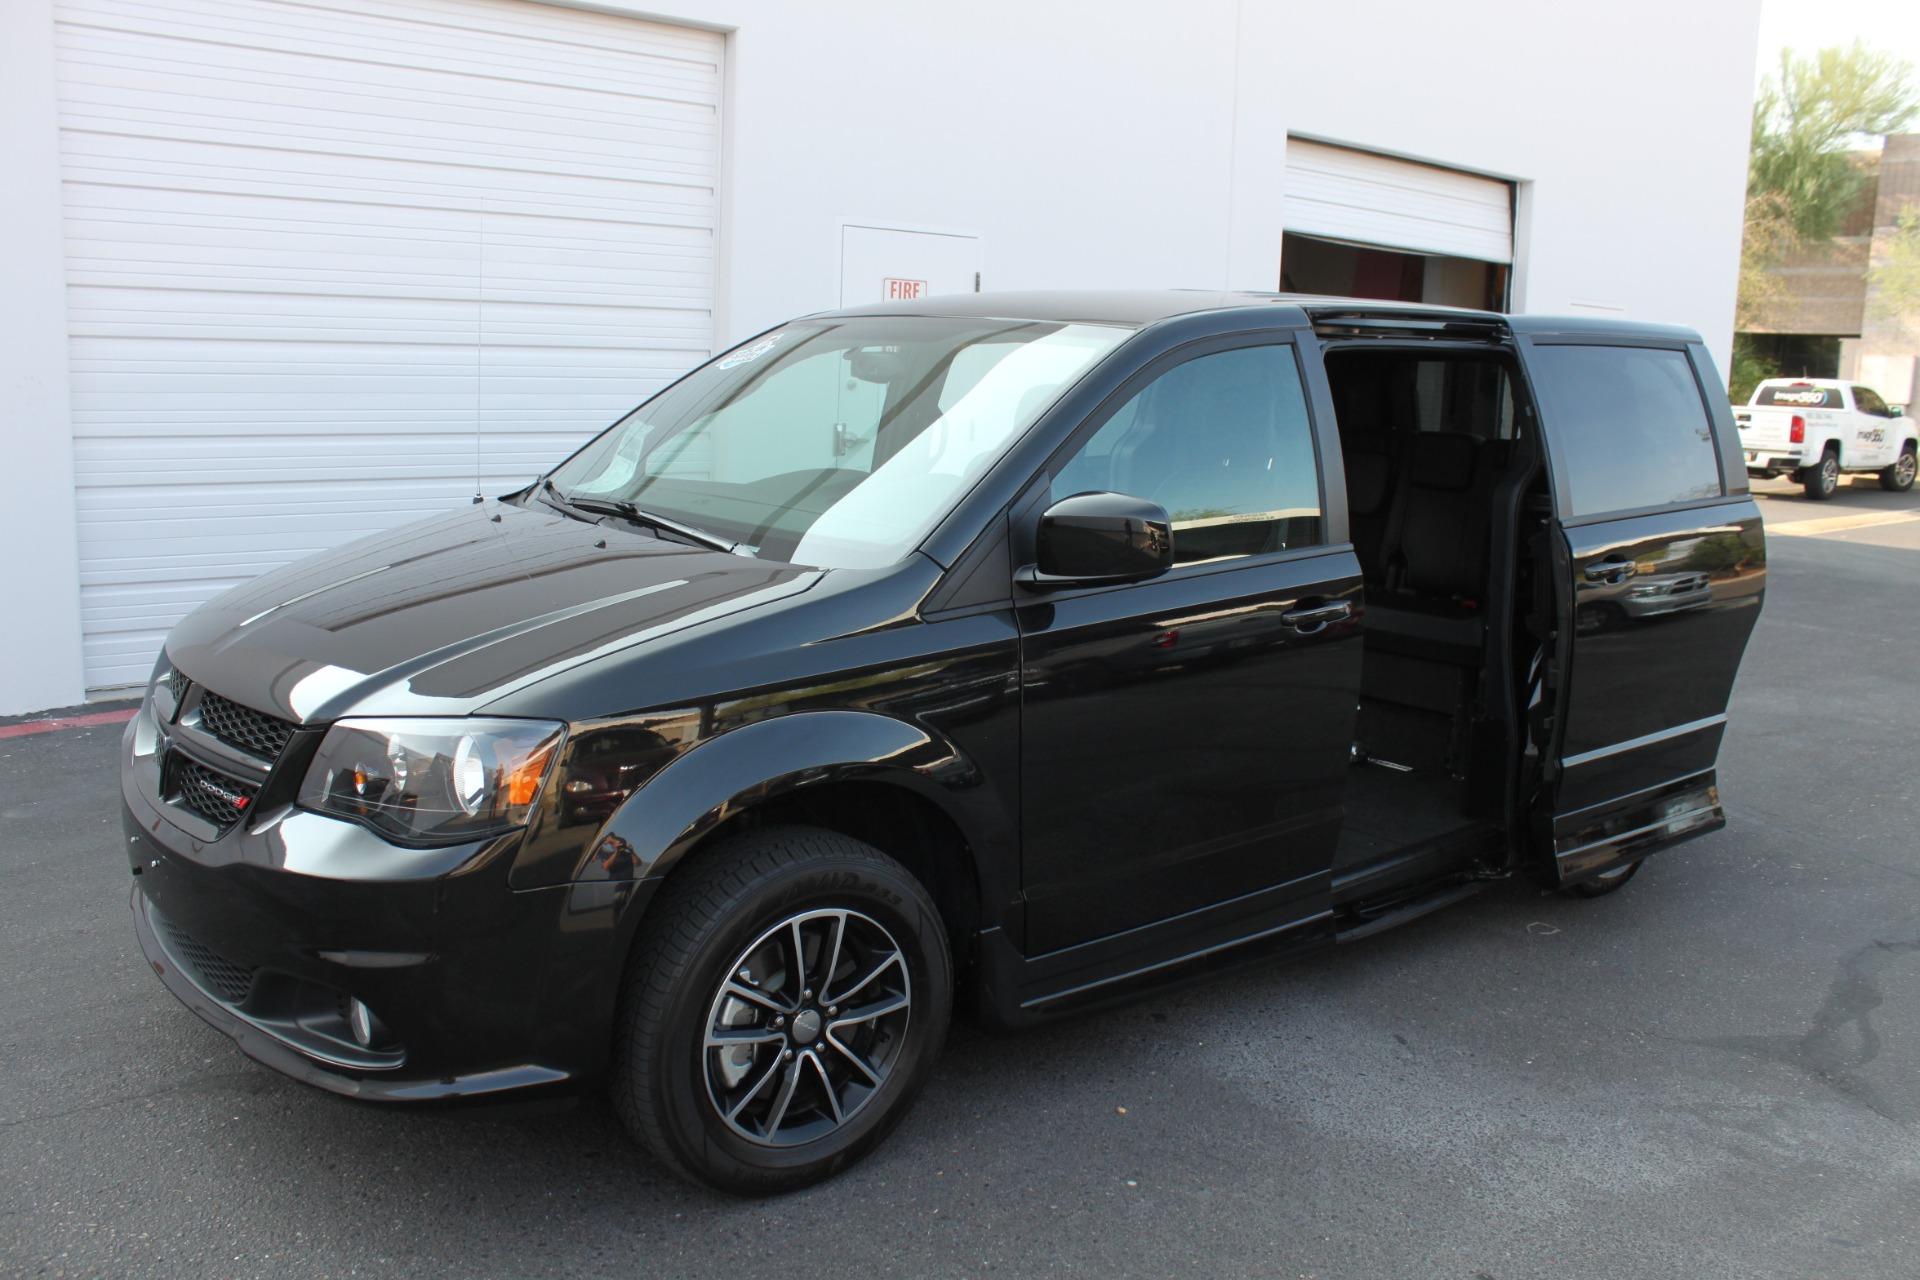 Used-2018-Dodge-Grand-Caravan-SXT-Rollx-Mobility-Conversion-Chevelle